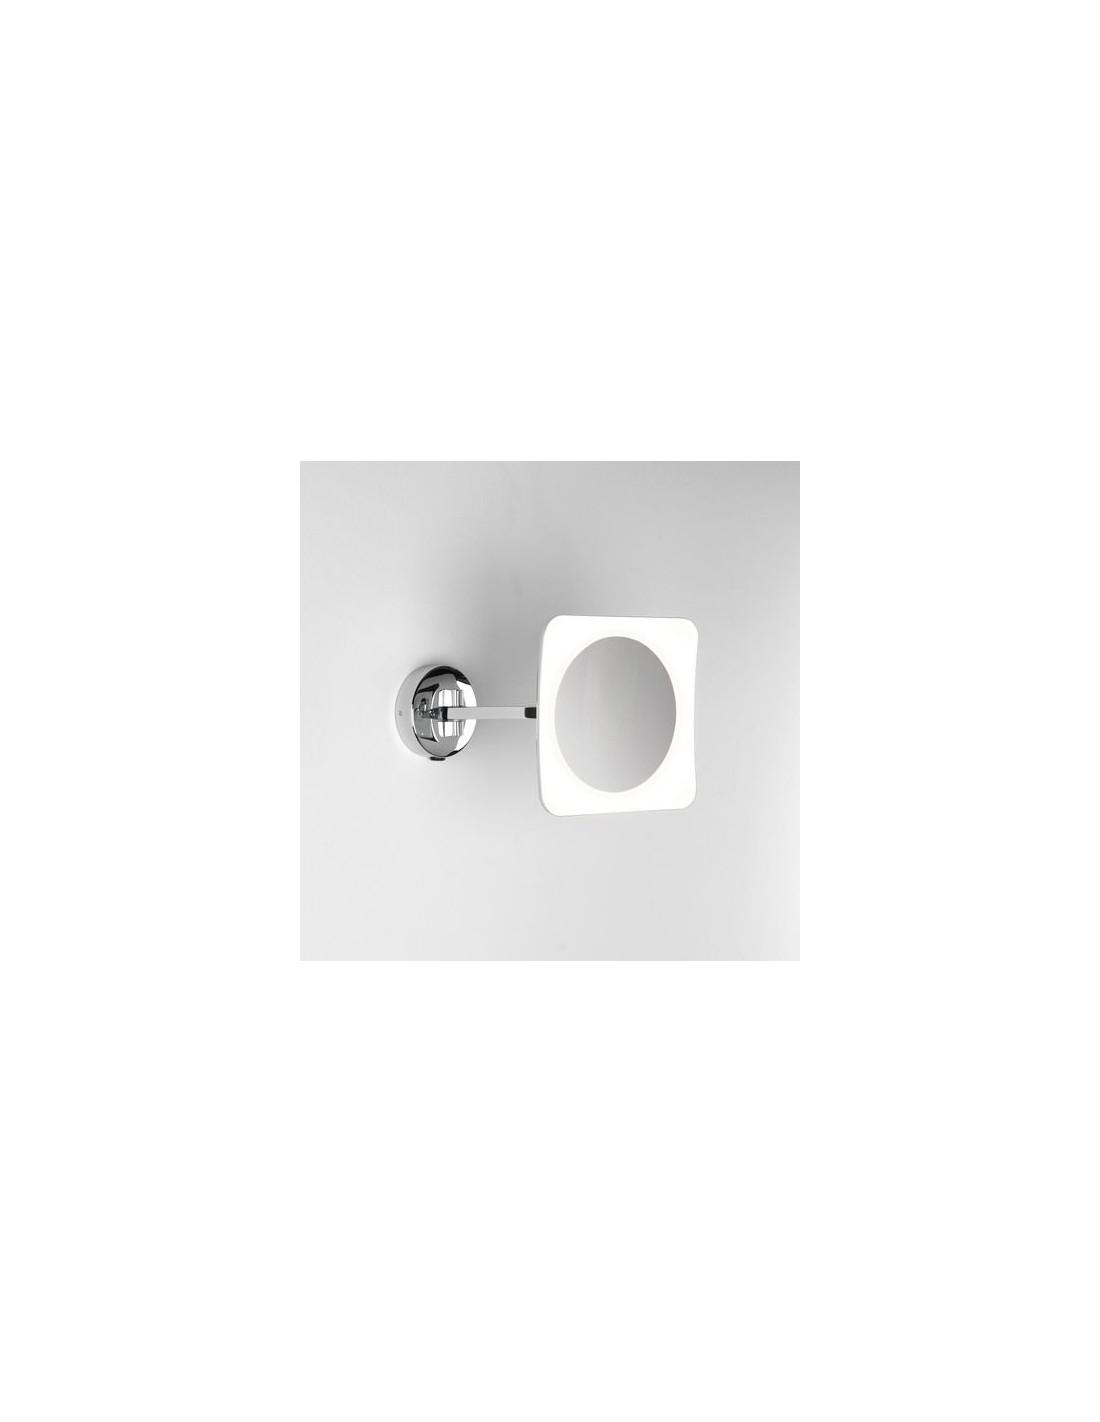 Miroir Mascali Square LED Astro Lighting